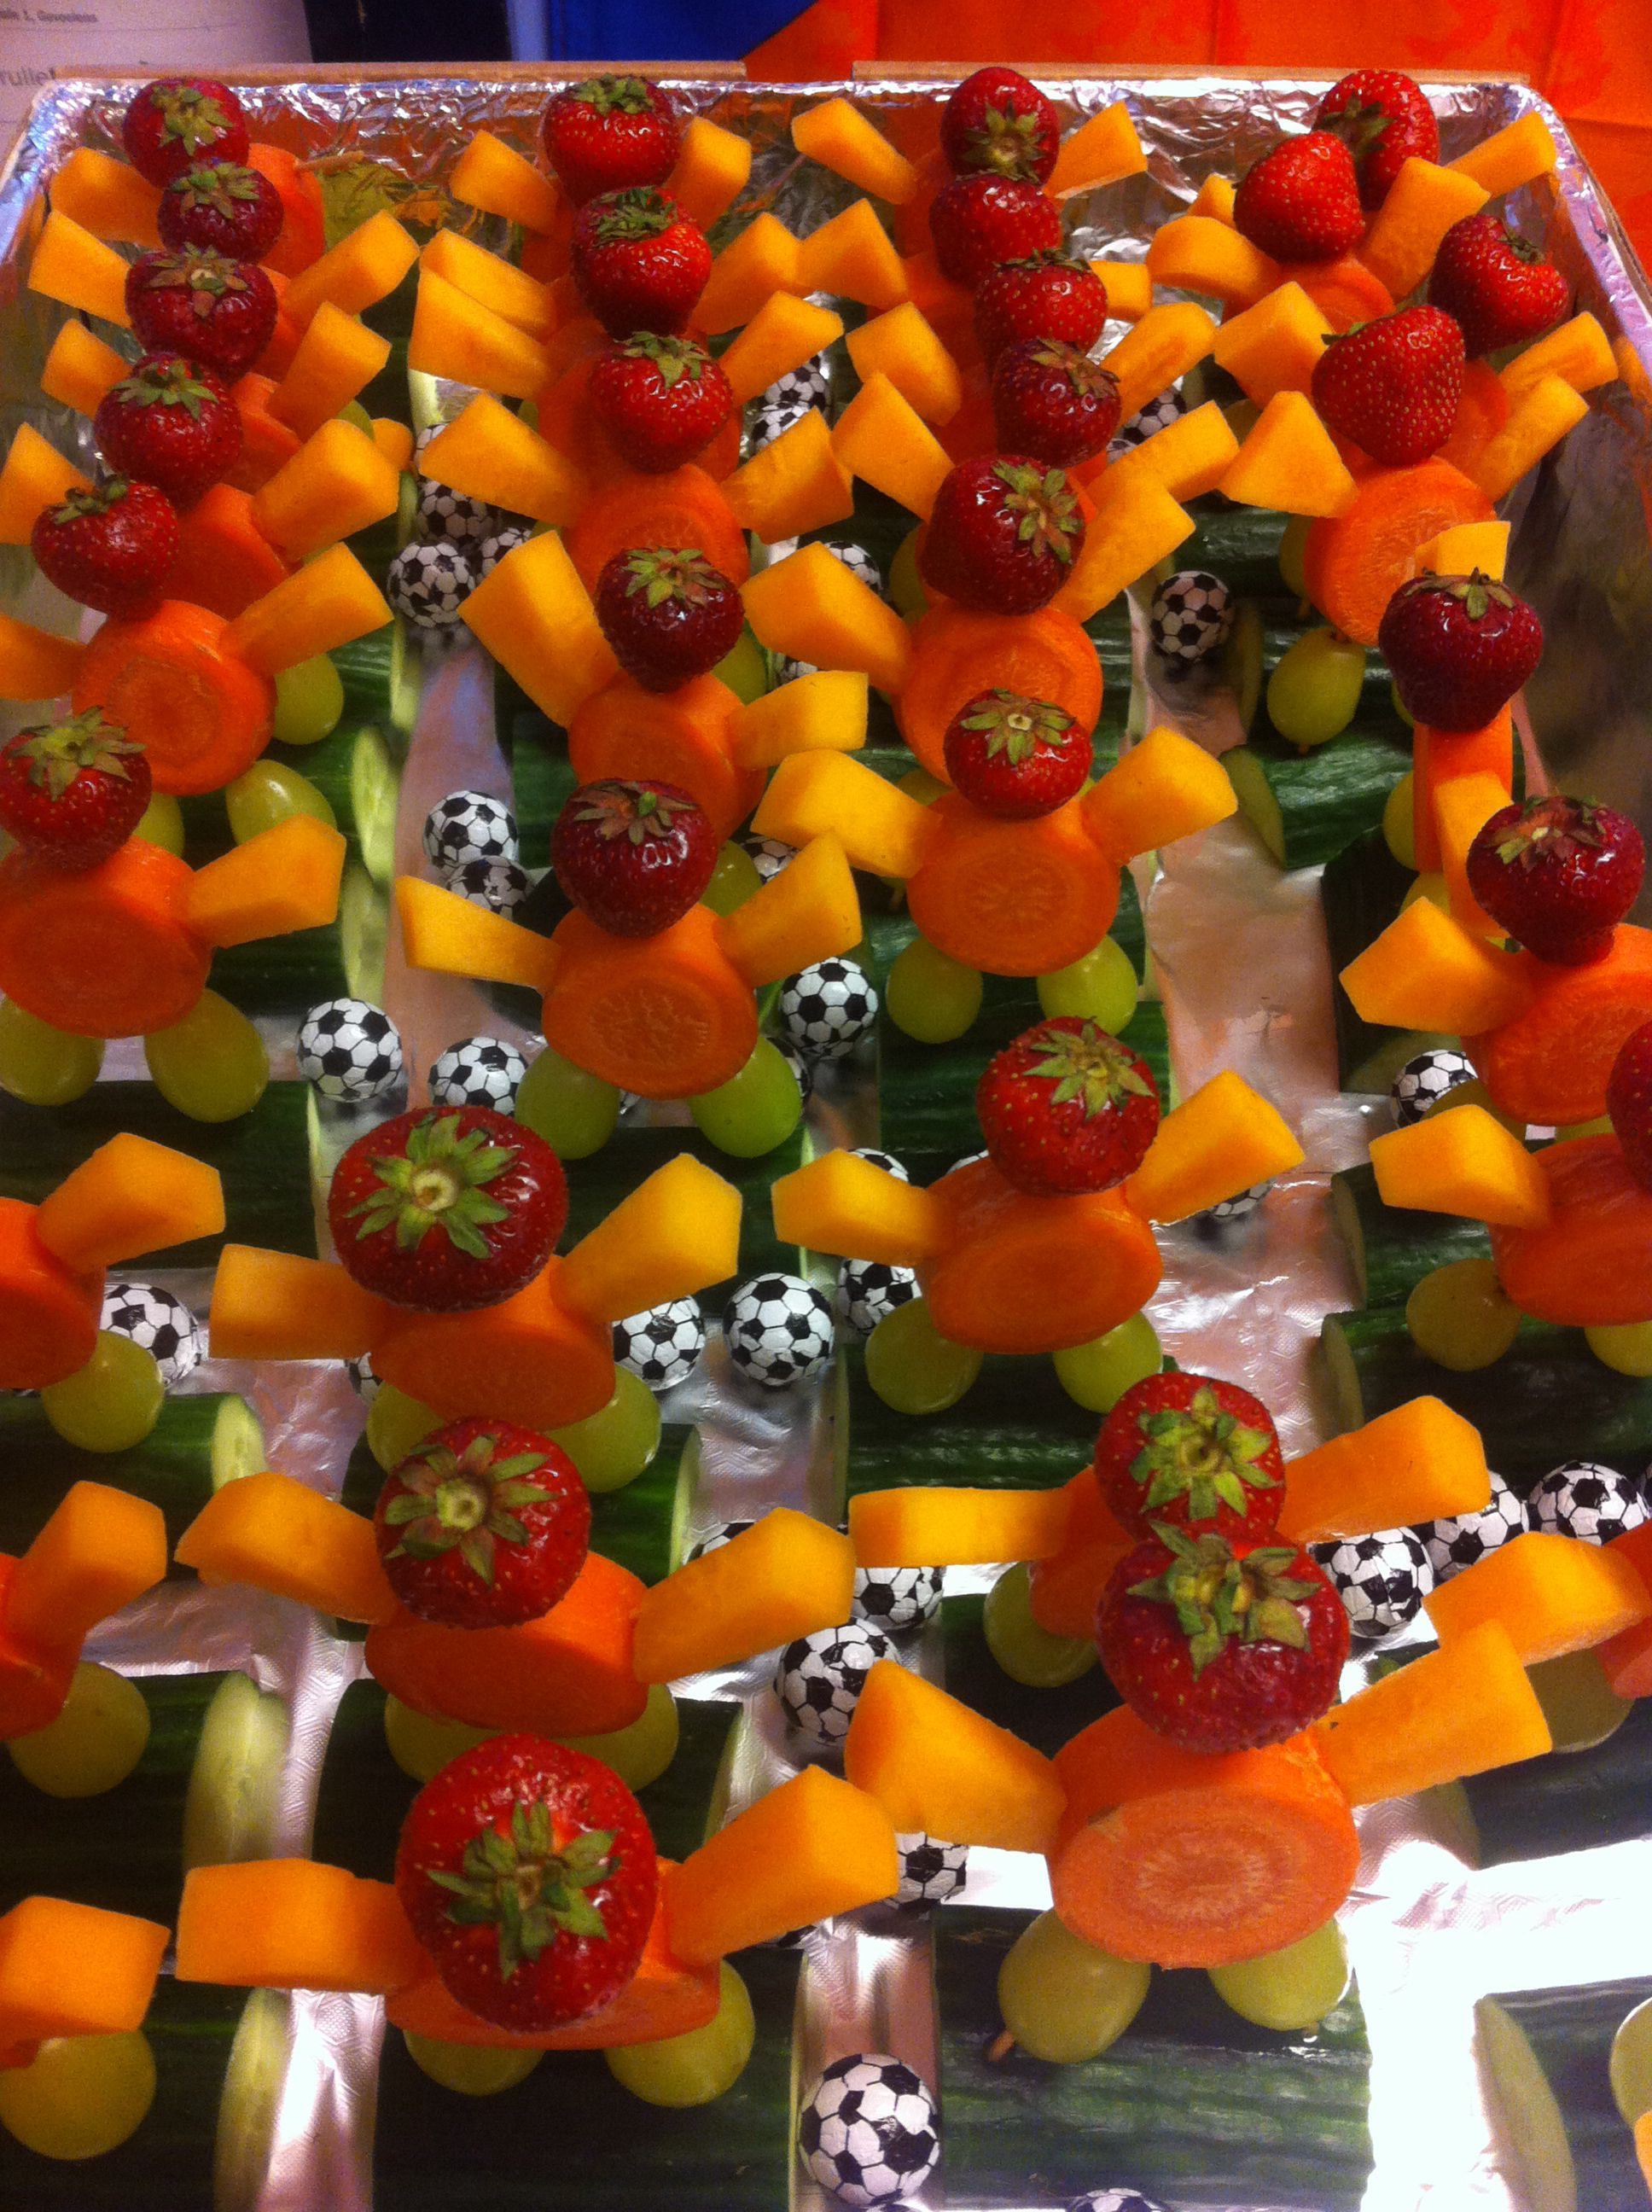 Hedendaags Leuke en gezonde voetbal traktatie | WK | fruit | groente KX-14